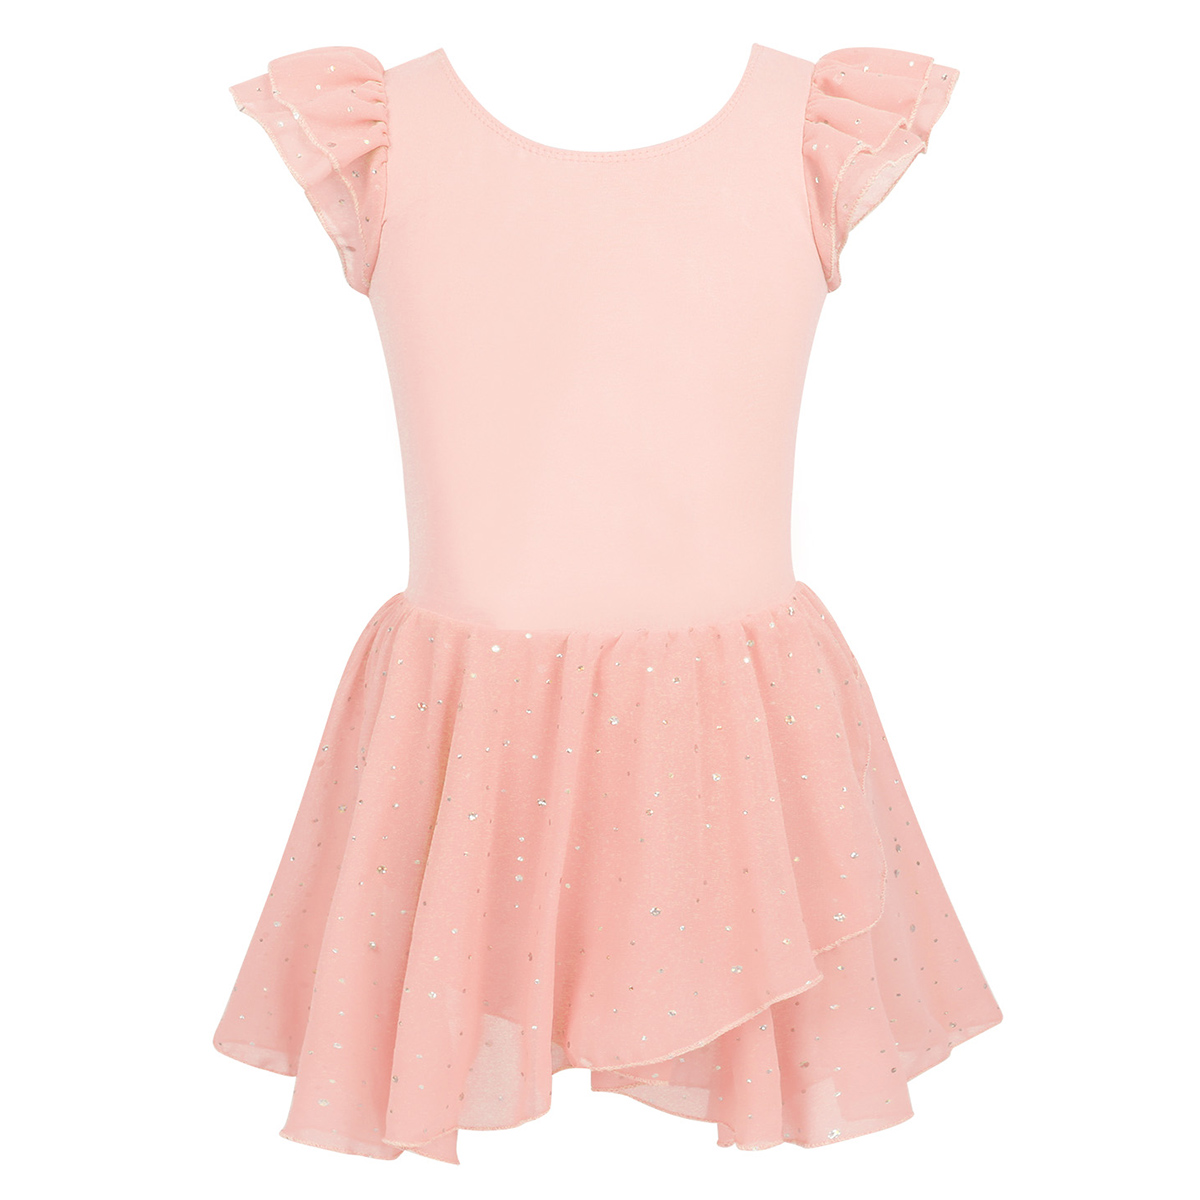 glittered foil Dance costume top shorts asymmetrical child//ladies Lime Blue